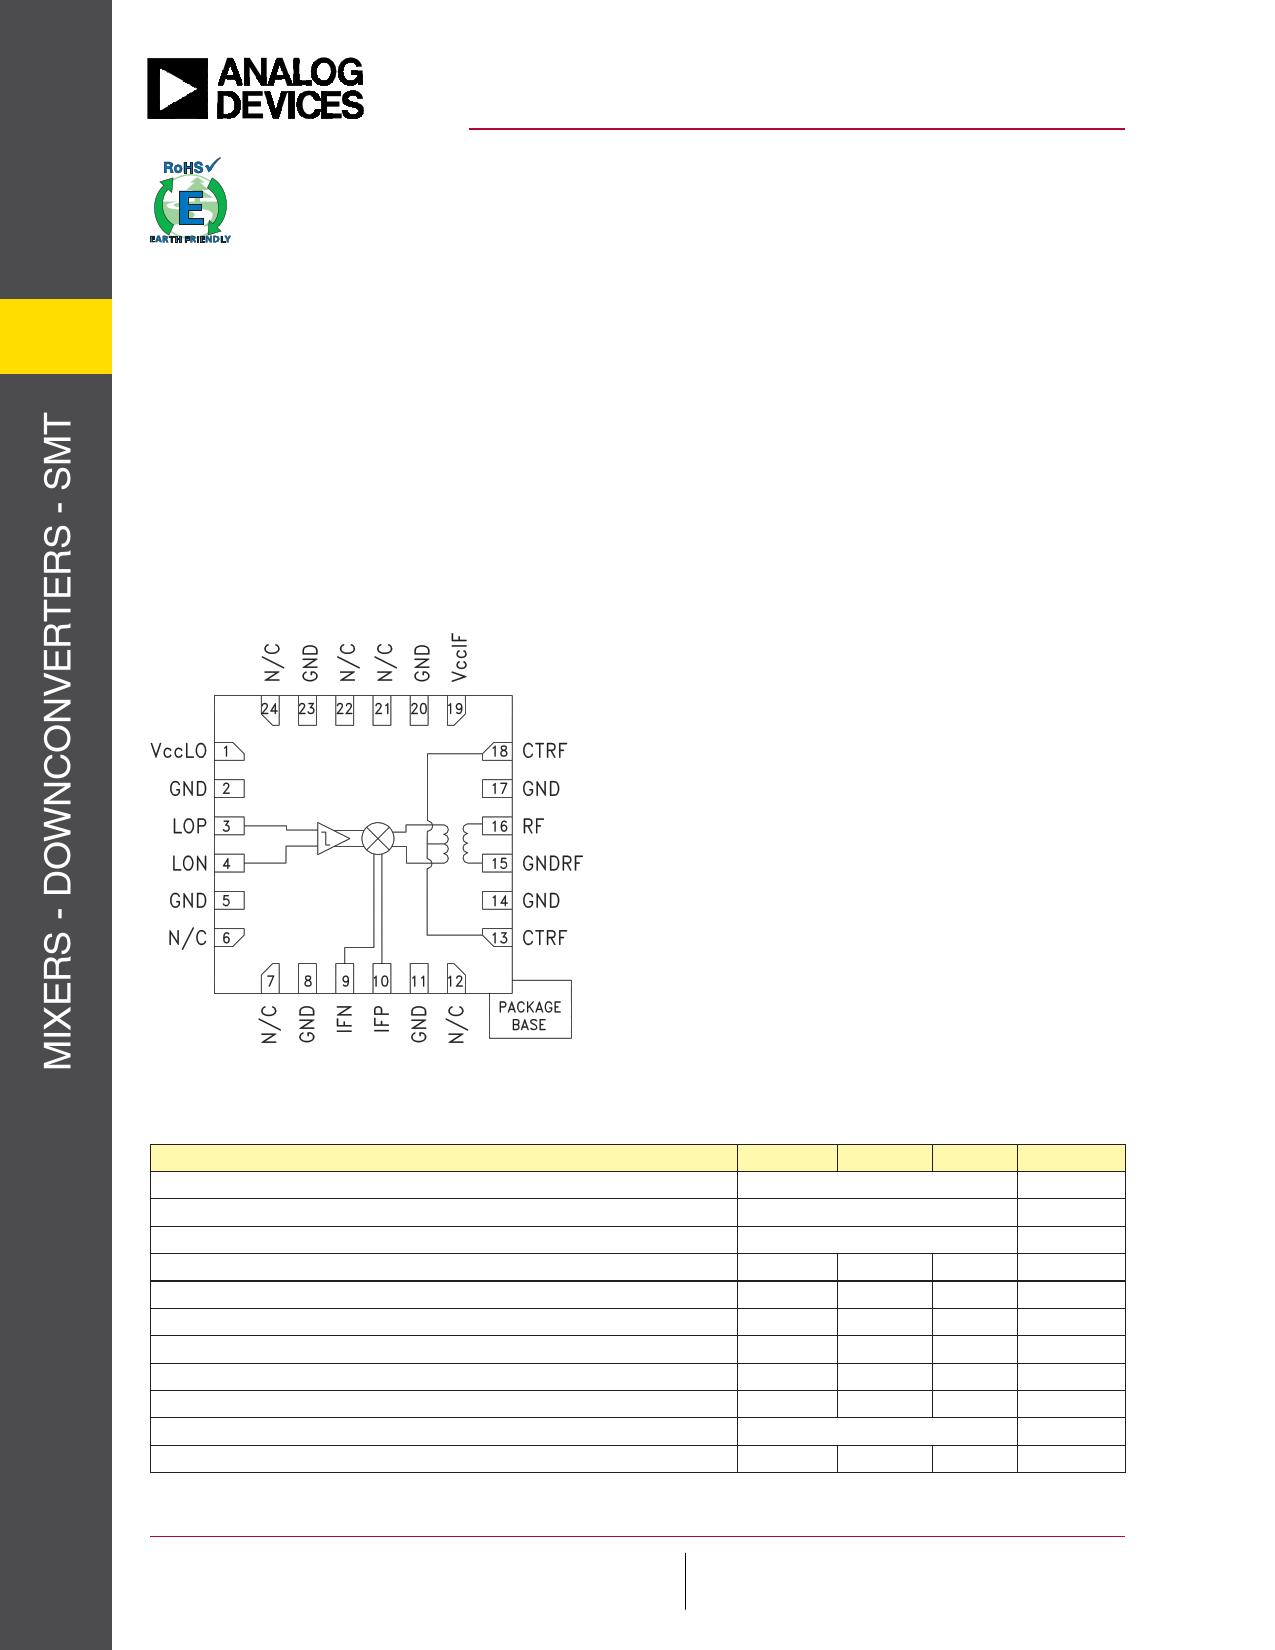 HMC334LP4E دیتاشیت PDF